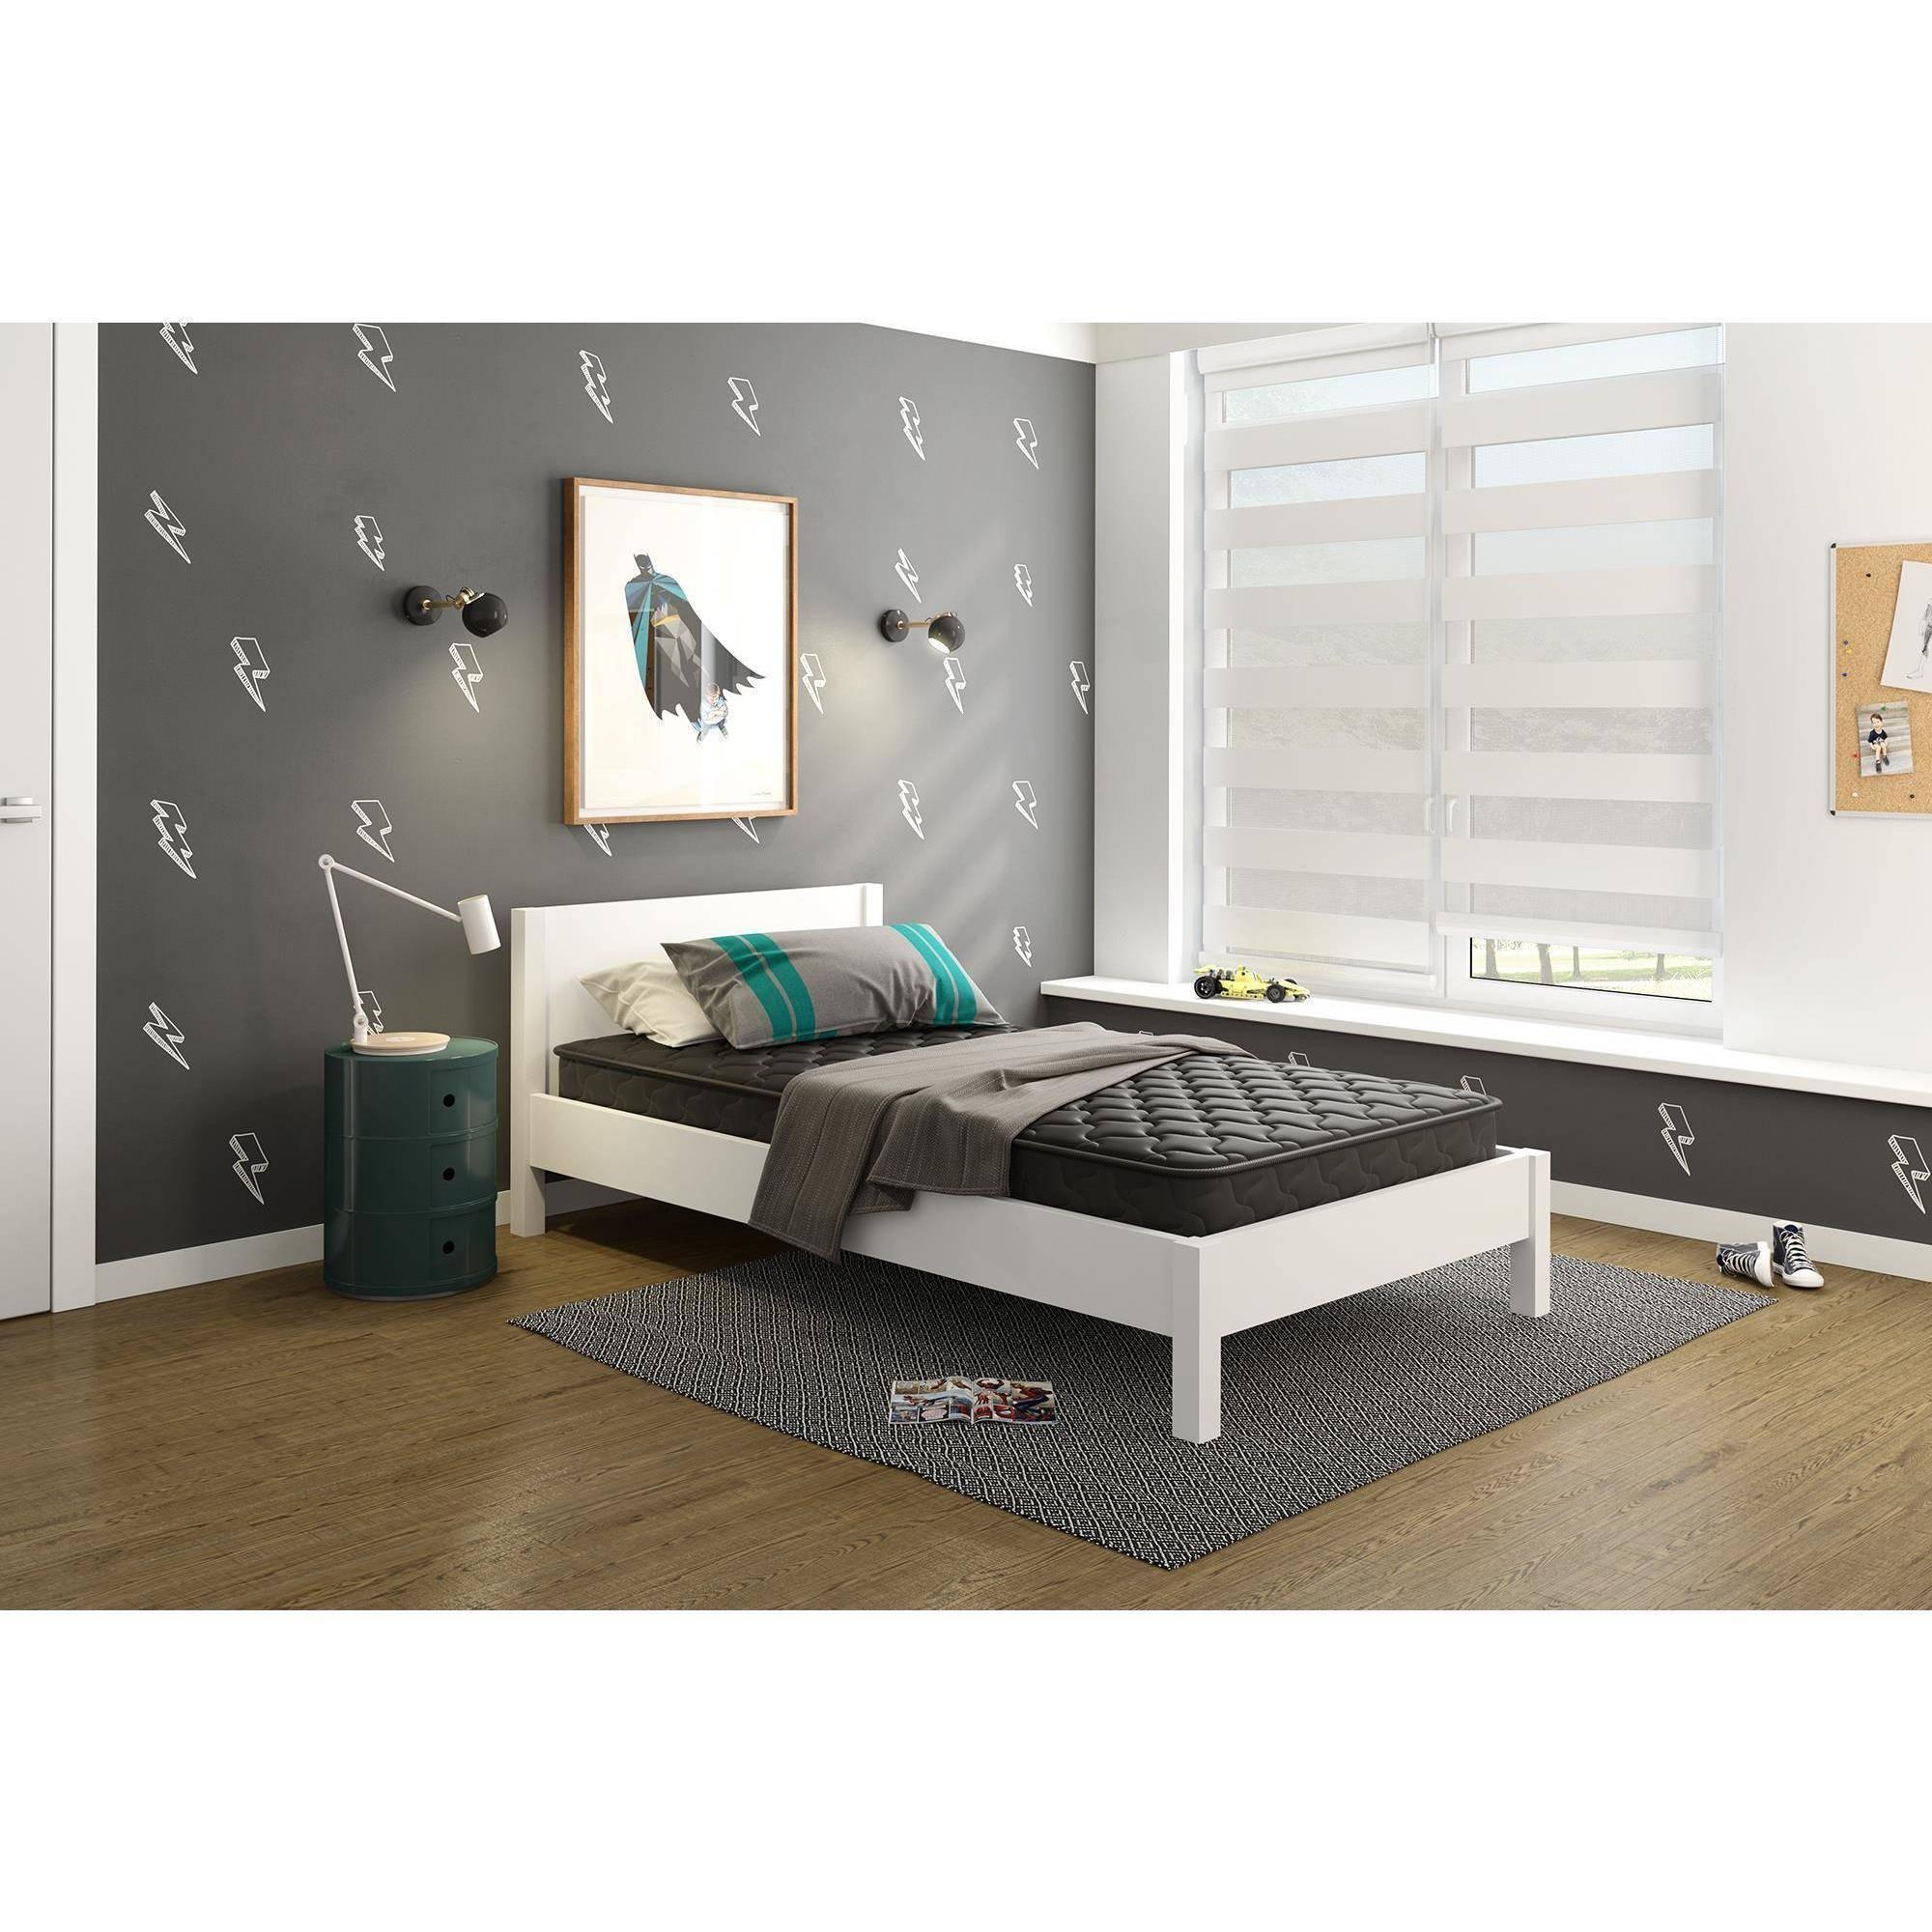 "Signature Sleep Essential - 6"" Black Coil Mattress, Multiple Sizes"